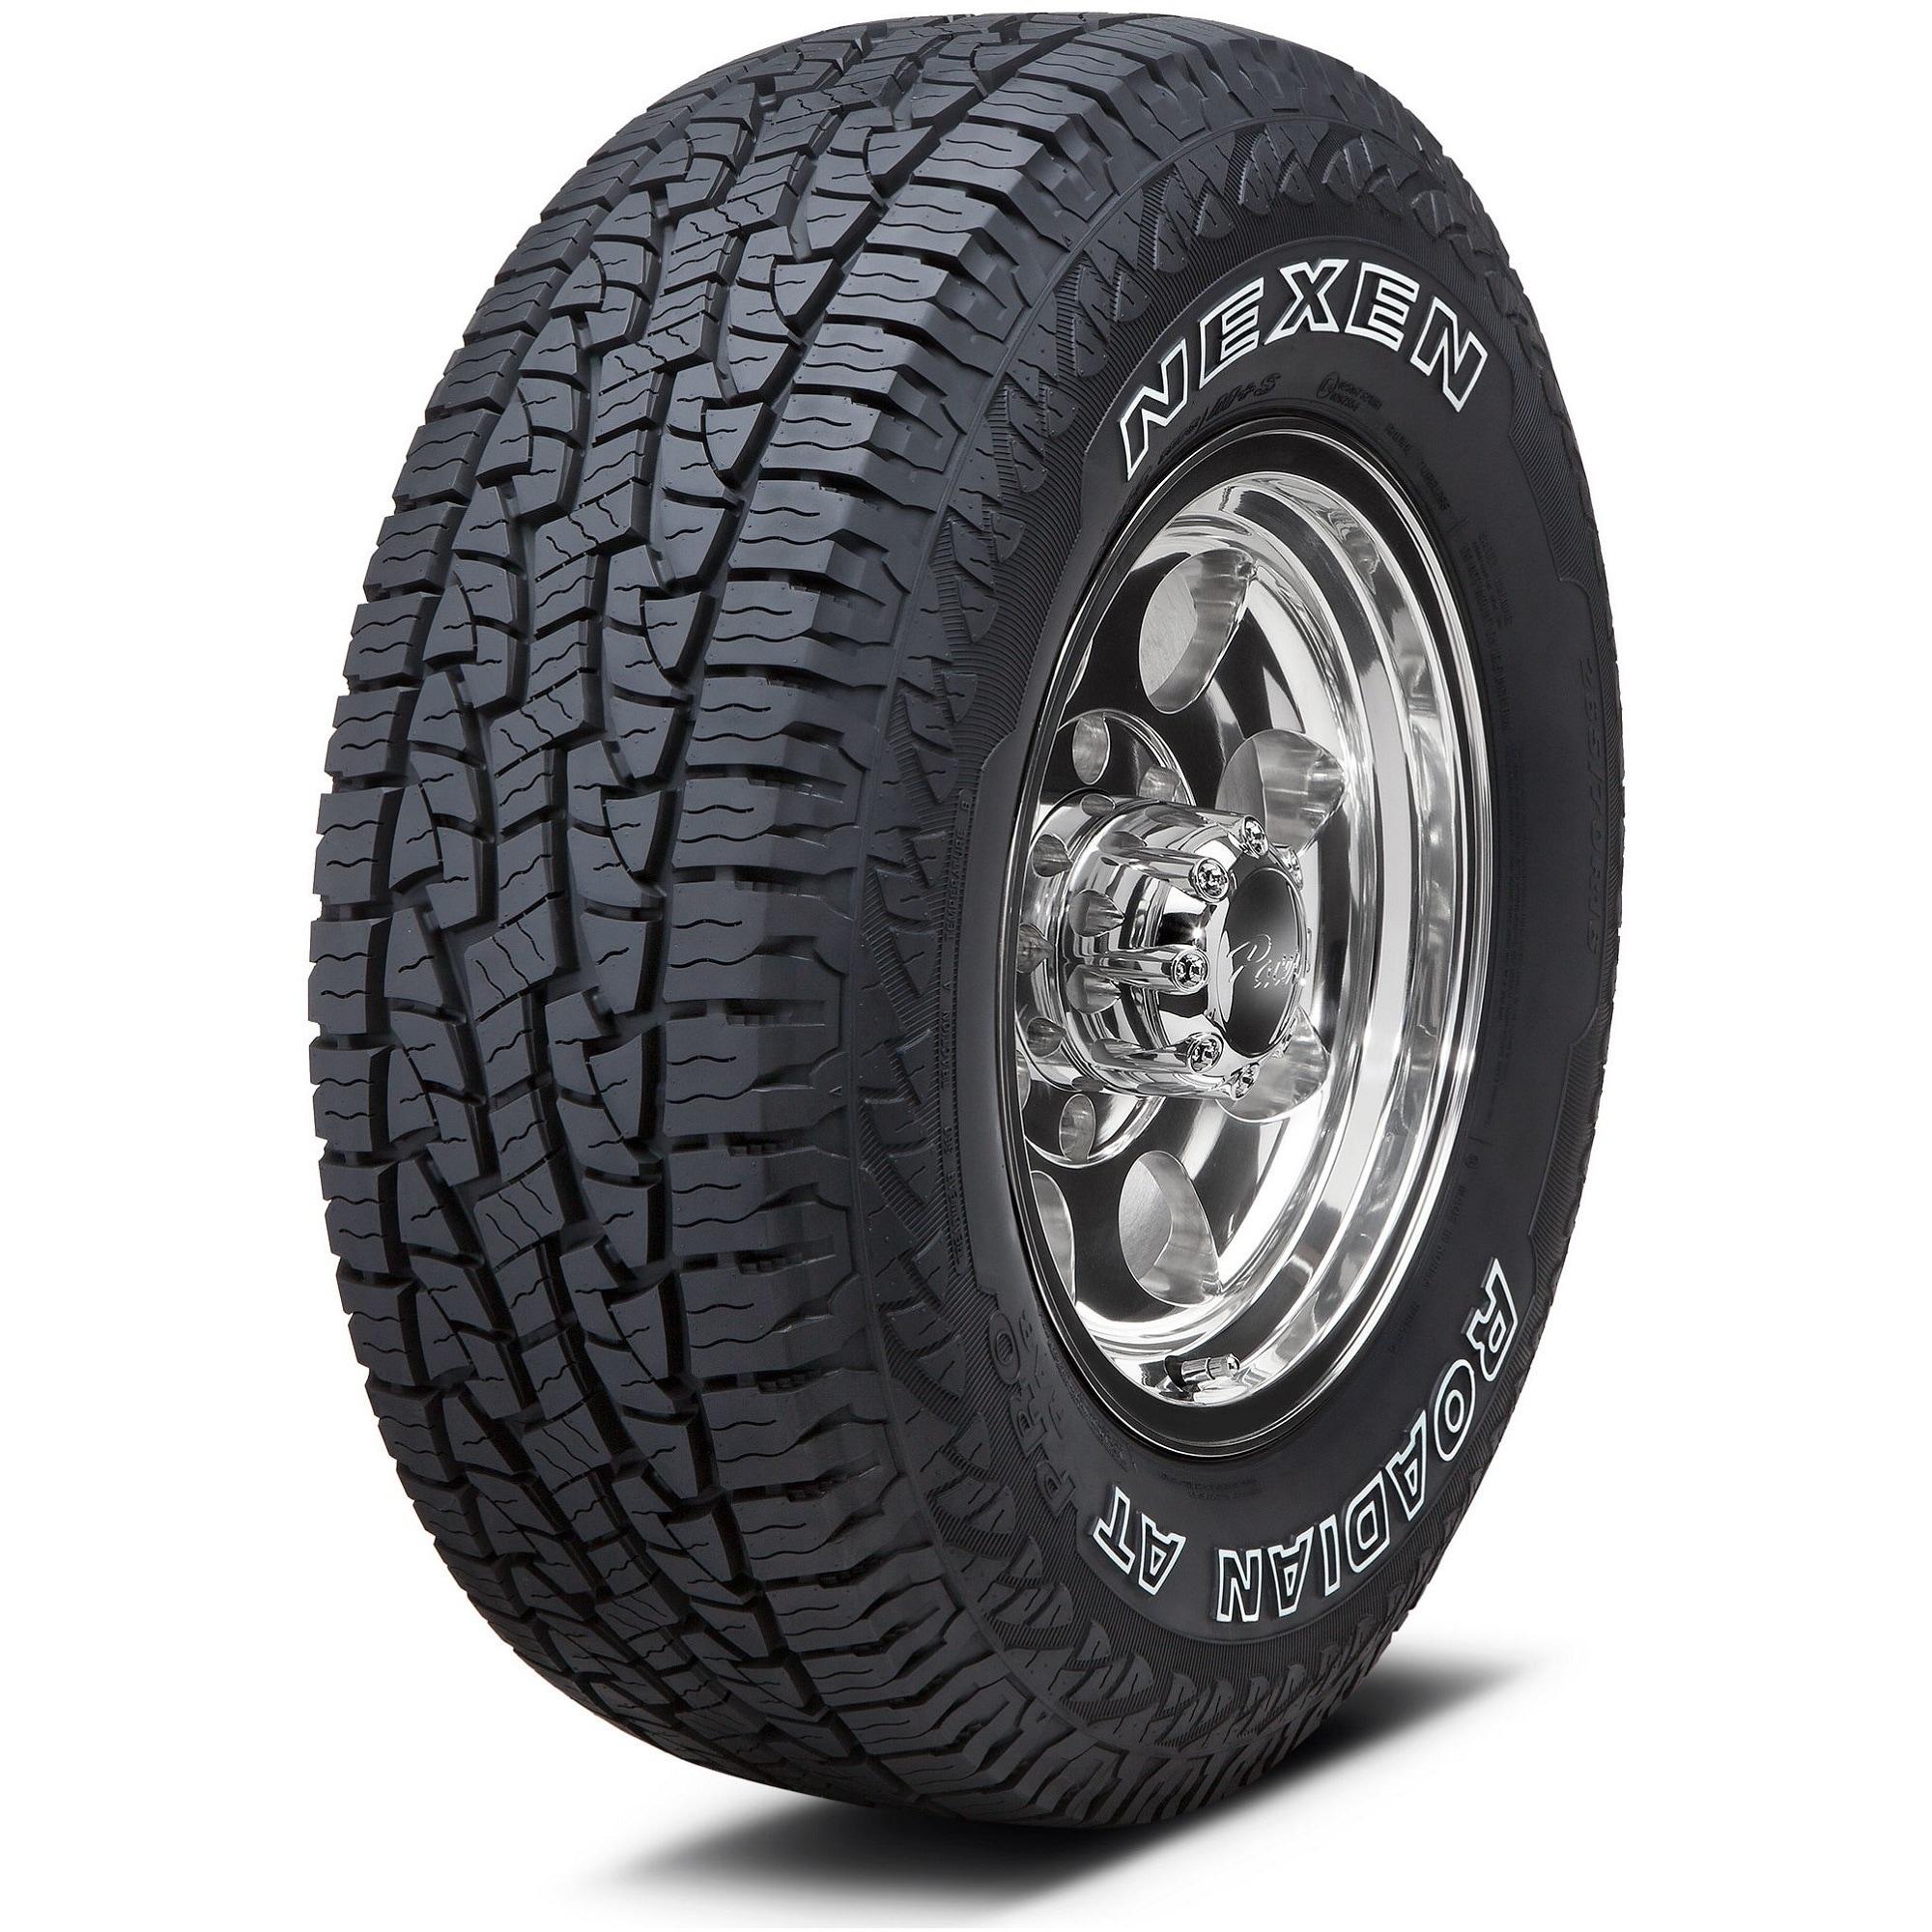 Nexen Roadian AT Pro RA8 All Terrain Tire - 31X10.50R15 L...